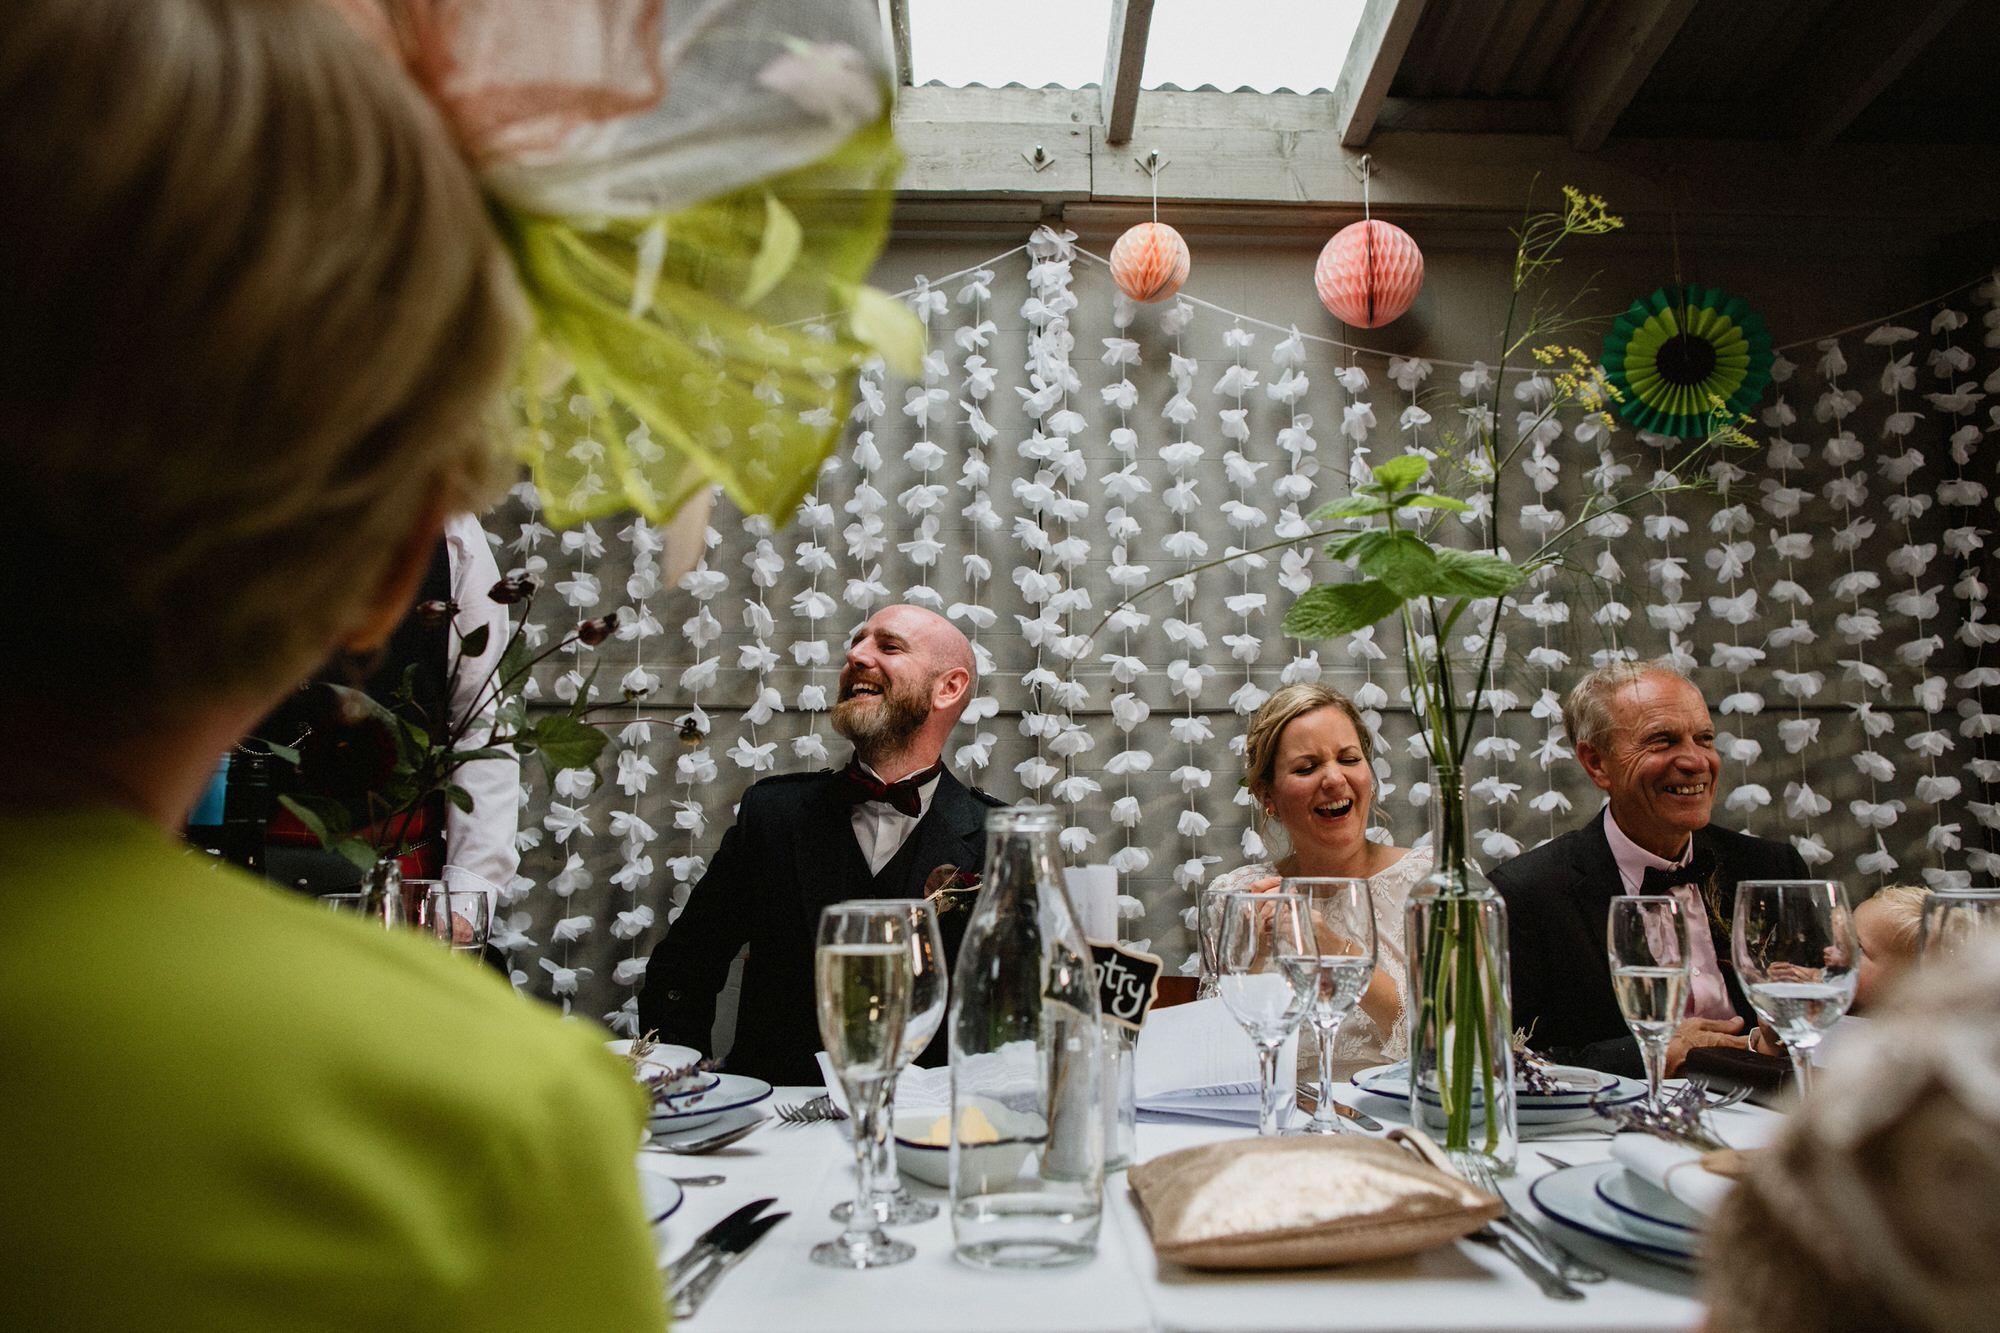 059 TIN SHED KNOCKRAICH WEDDING AUTUMN ZOE ALEXANDRA PHOTOGRAPHY